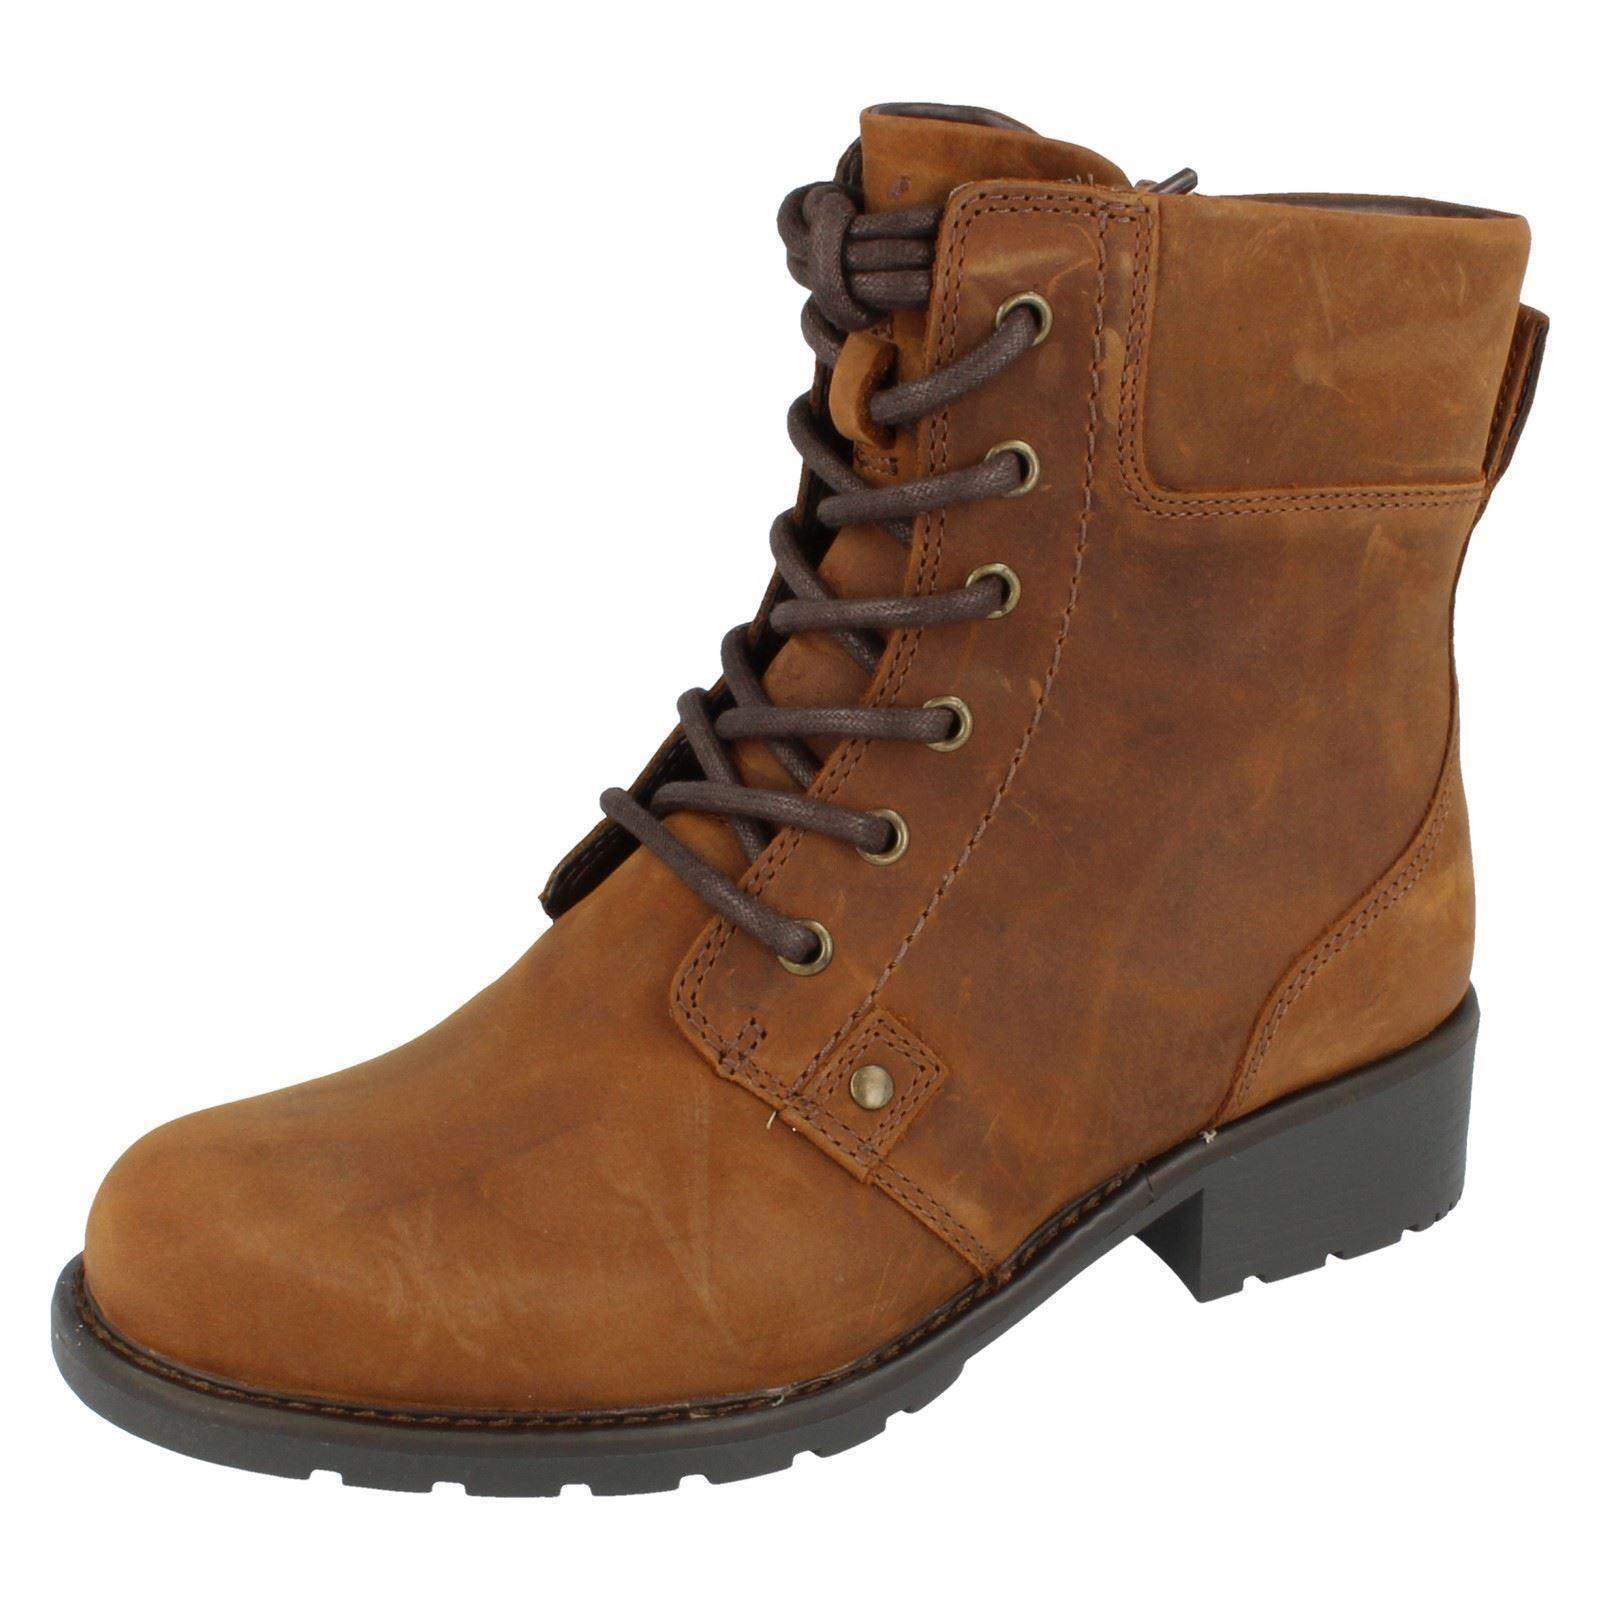 Ladies-Clarks-Ankle-Boots-039-Orinoco-Spice-039